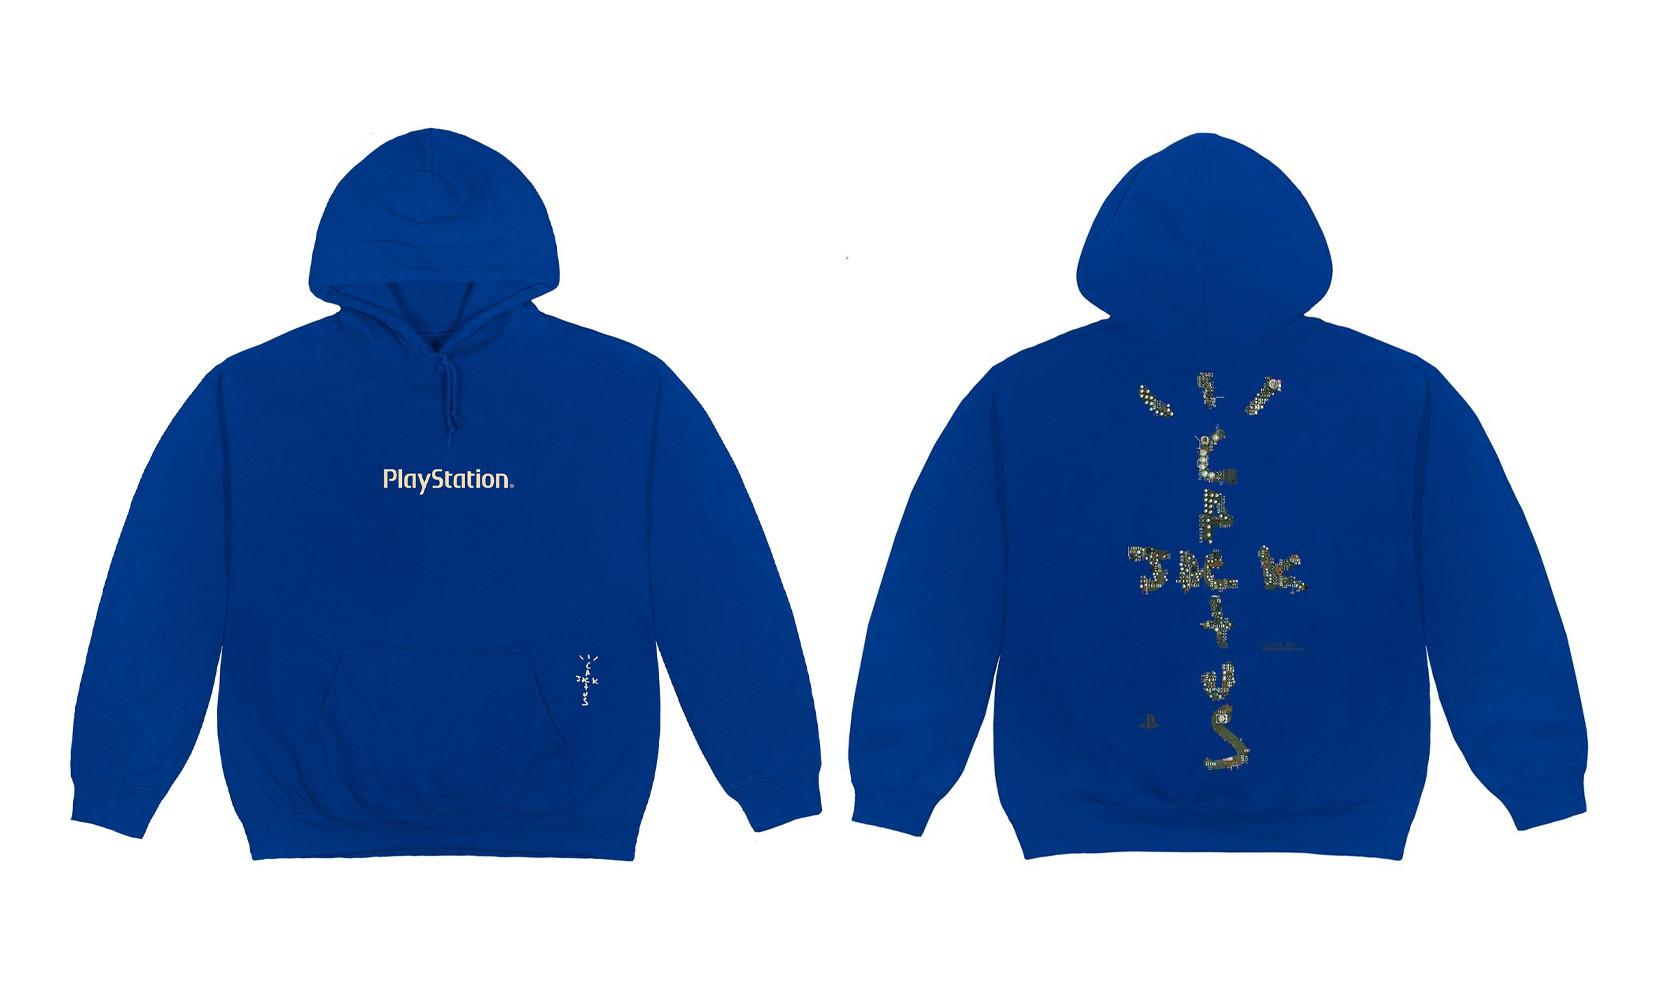 Hoodie Travis Scott x Playstation